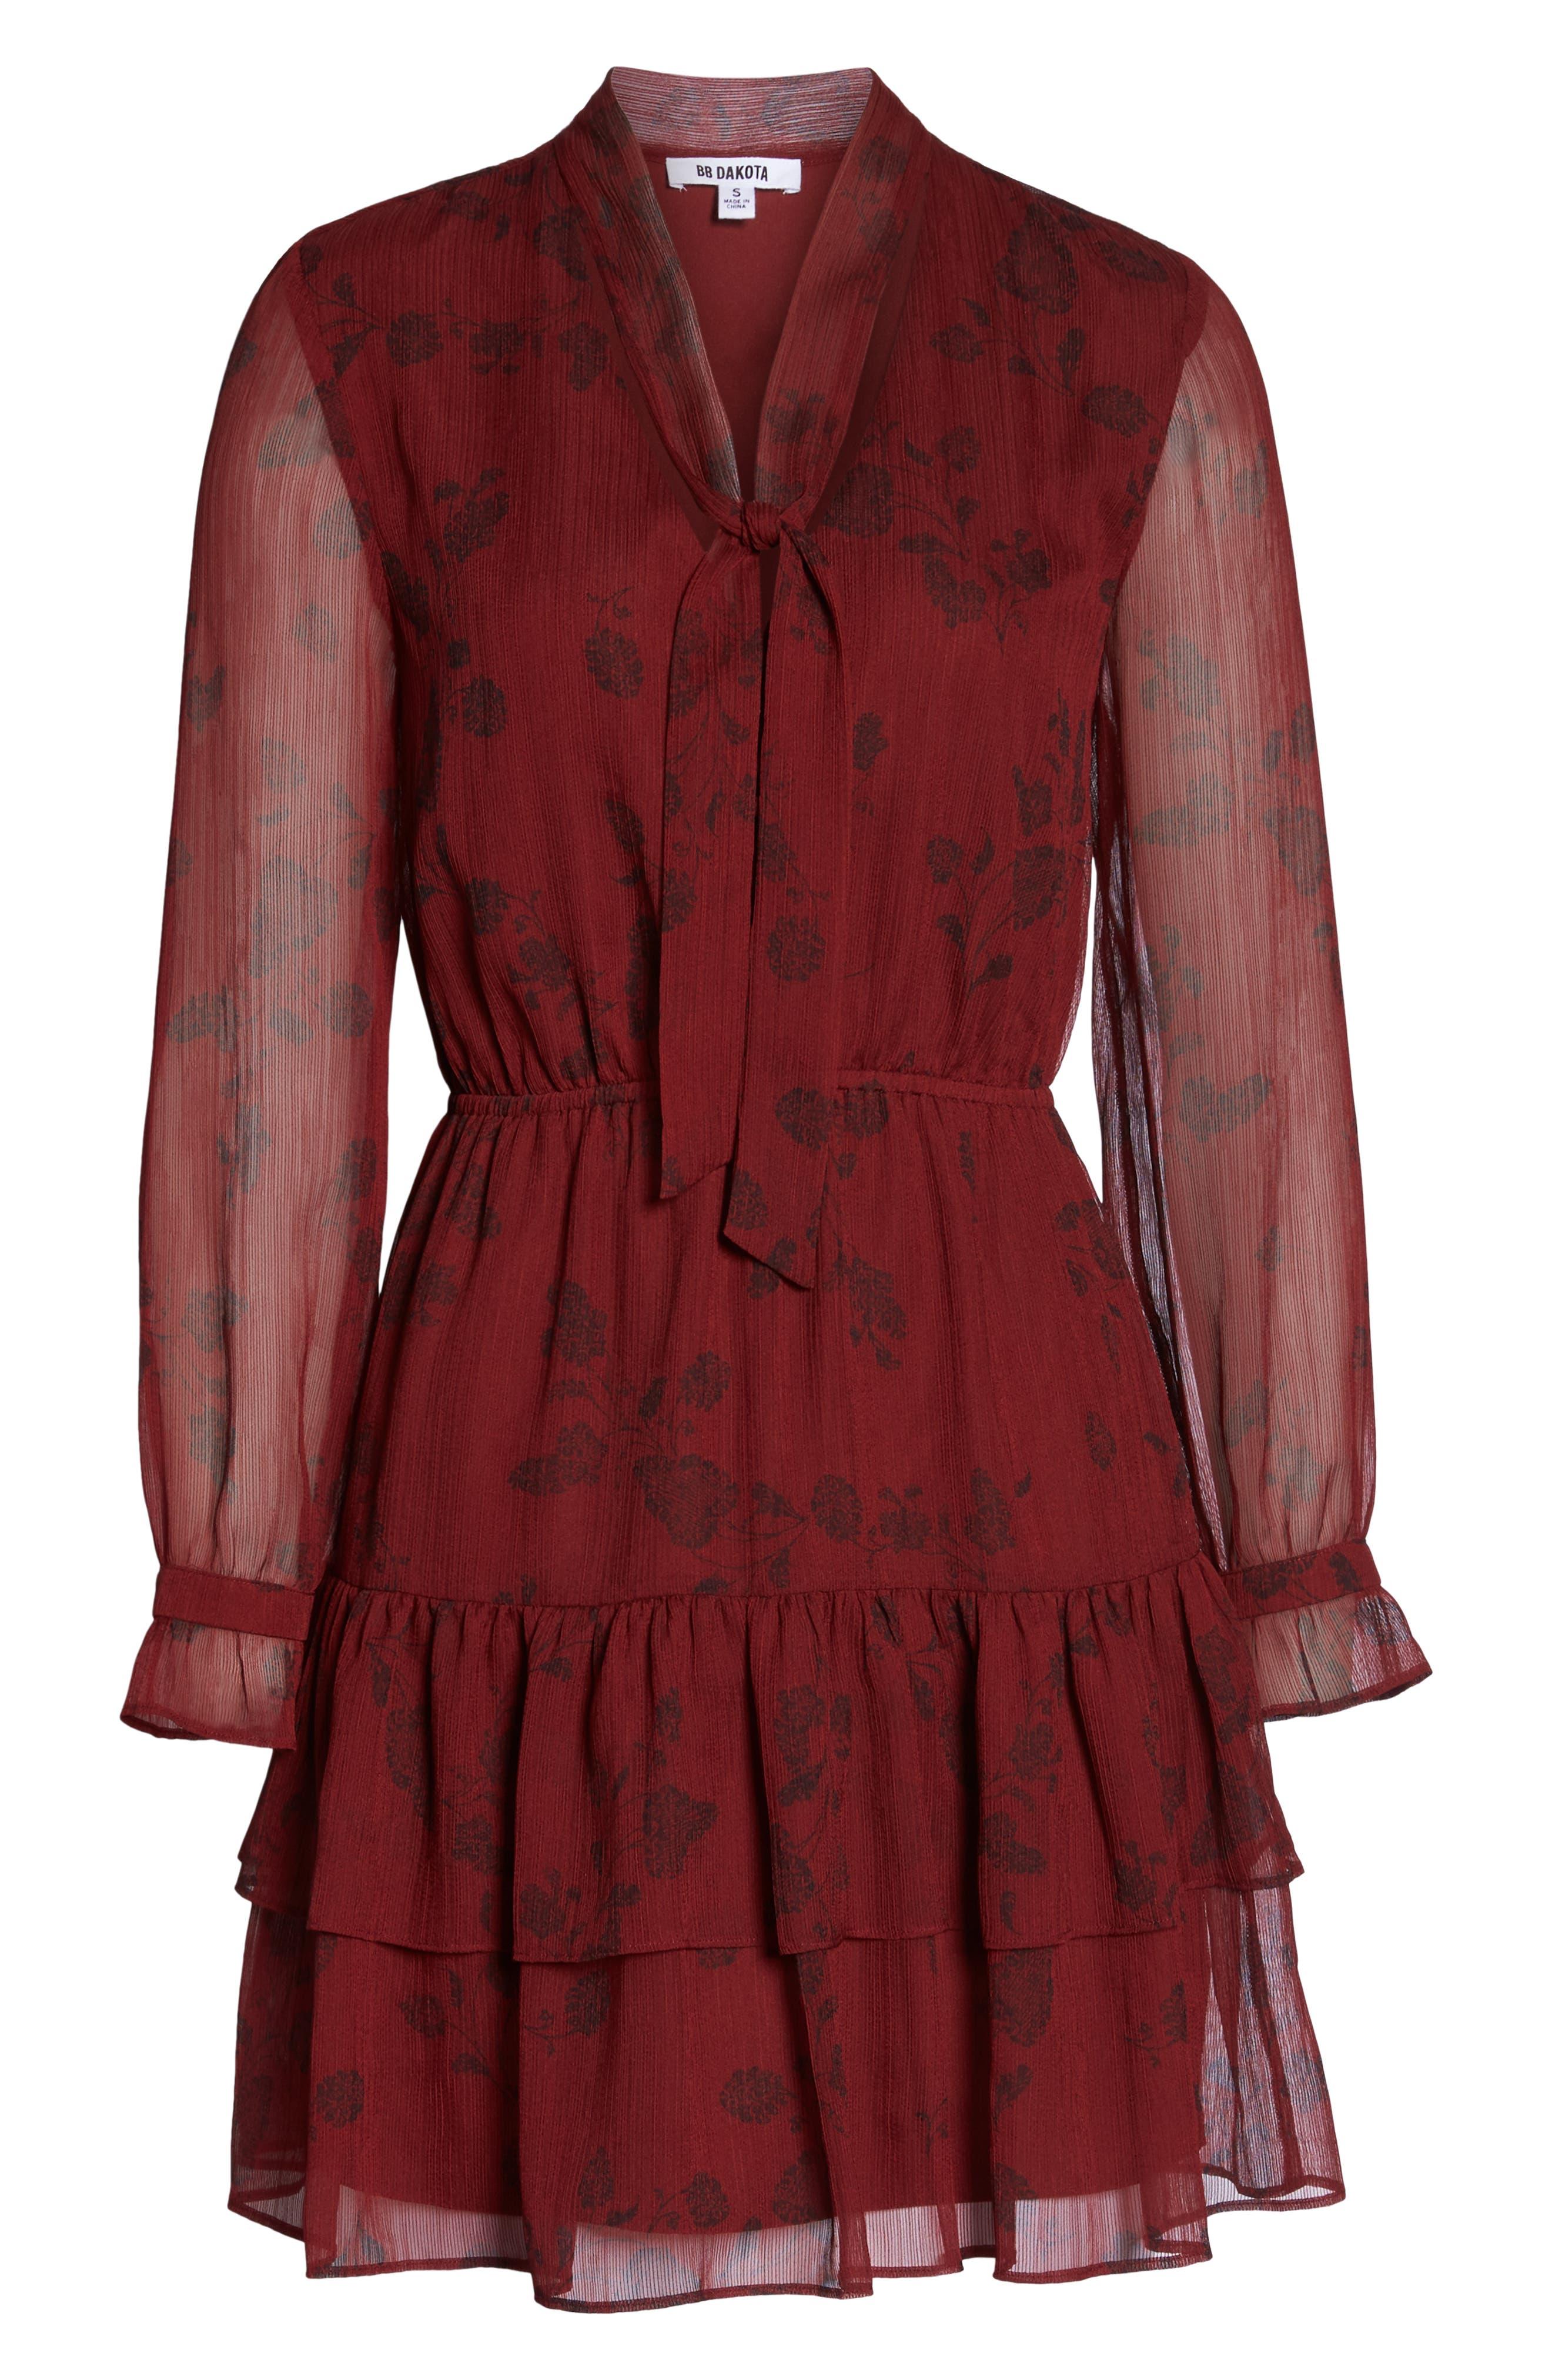 BB DAKOTA,                             Wine Down Print Chiffon Dress,                             Alternate thumbnail 7, color,                             SUNDRIED TOMATO